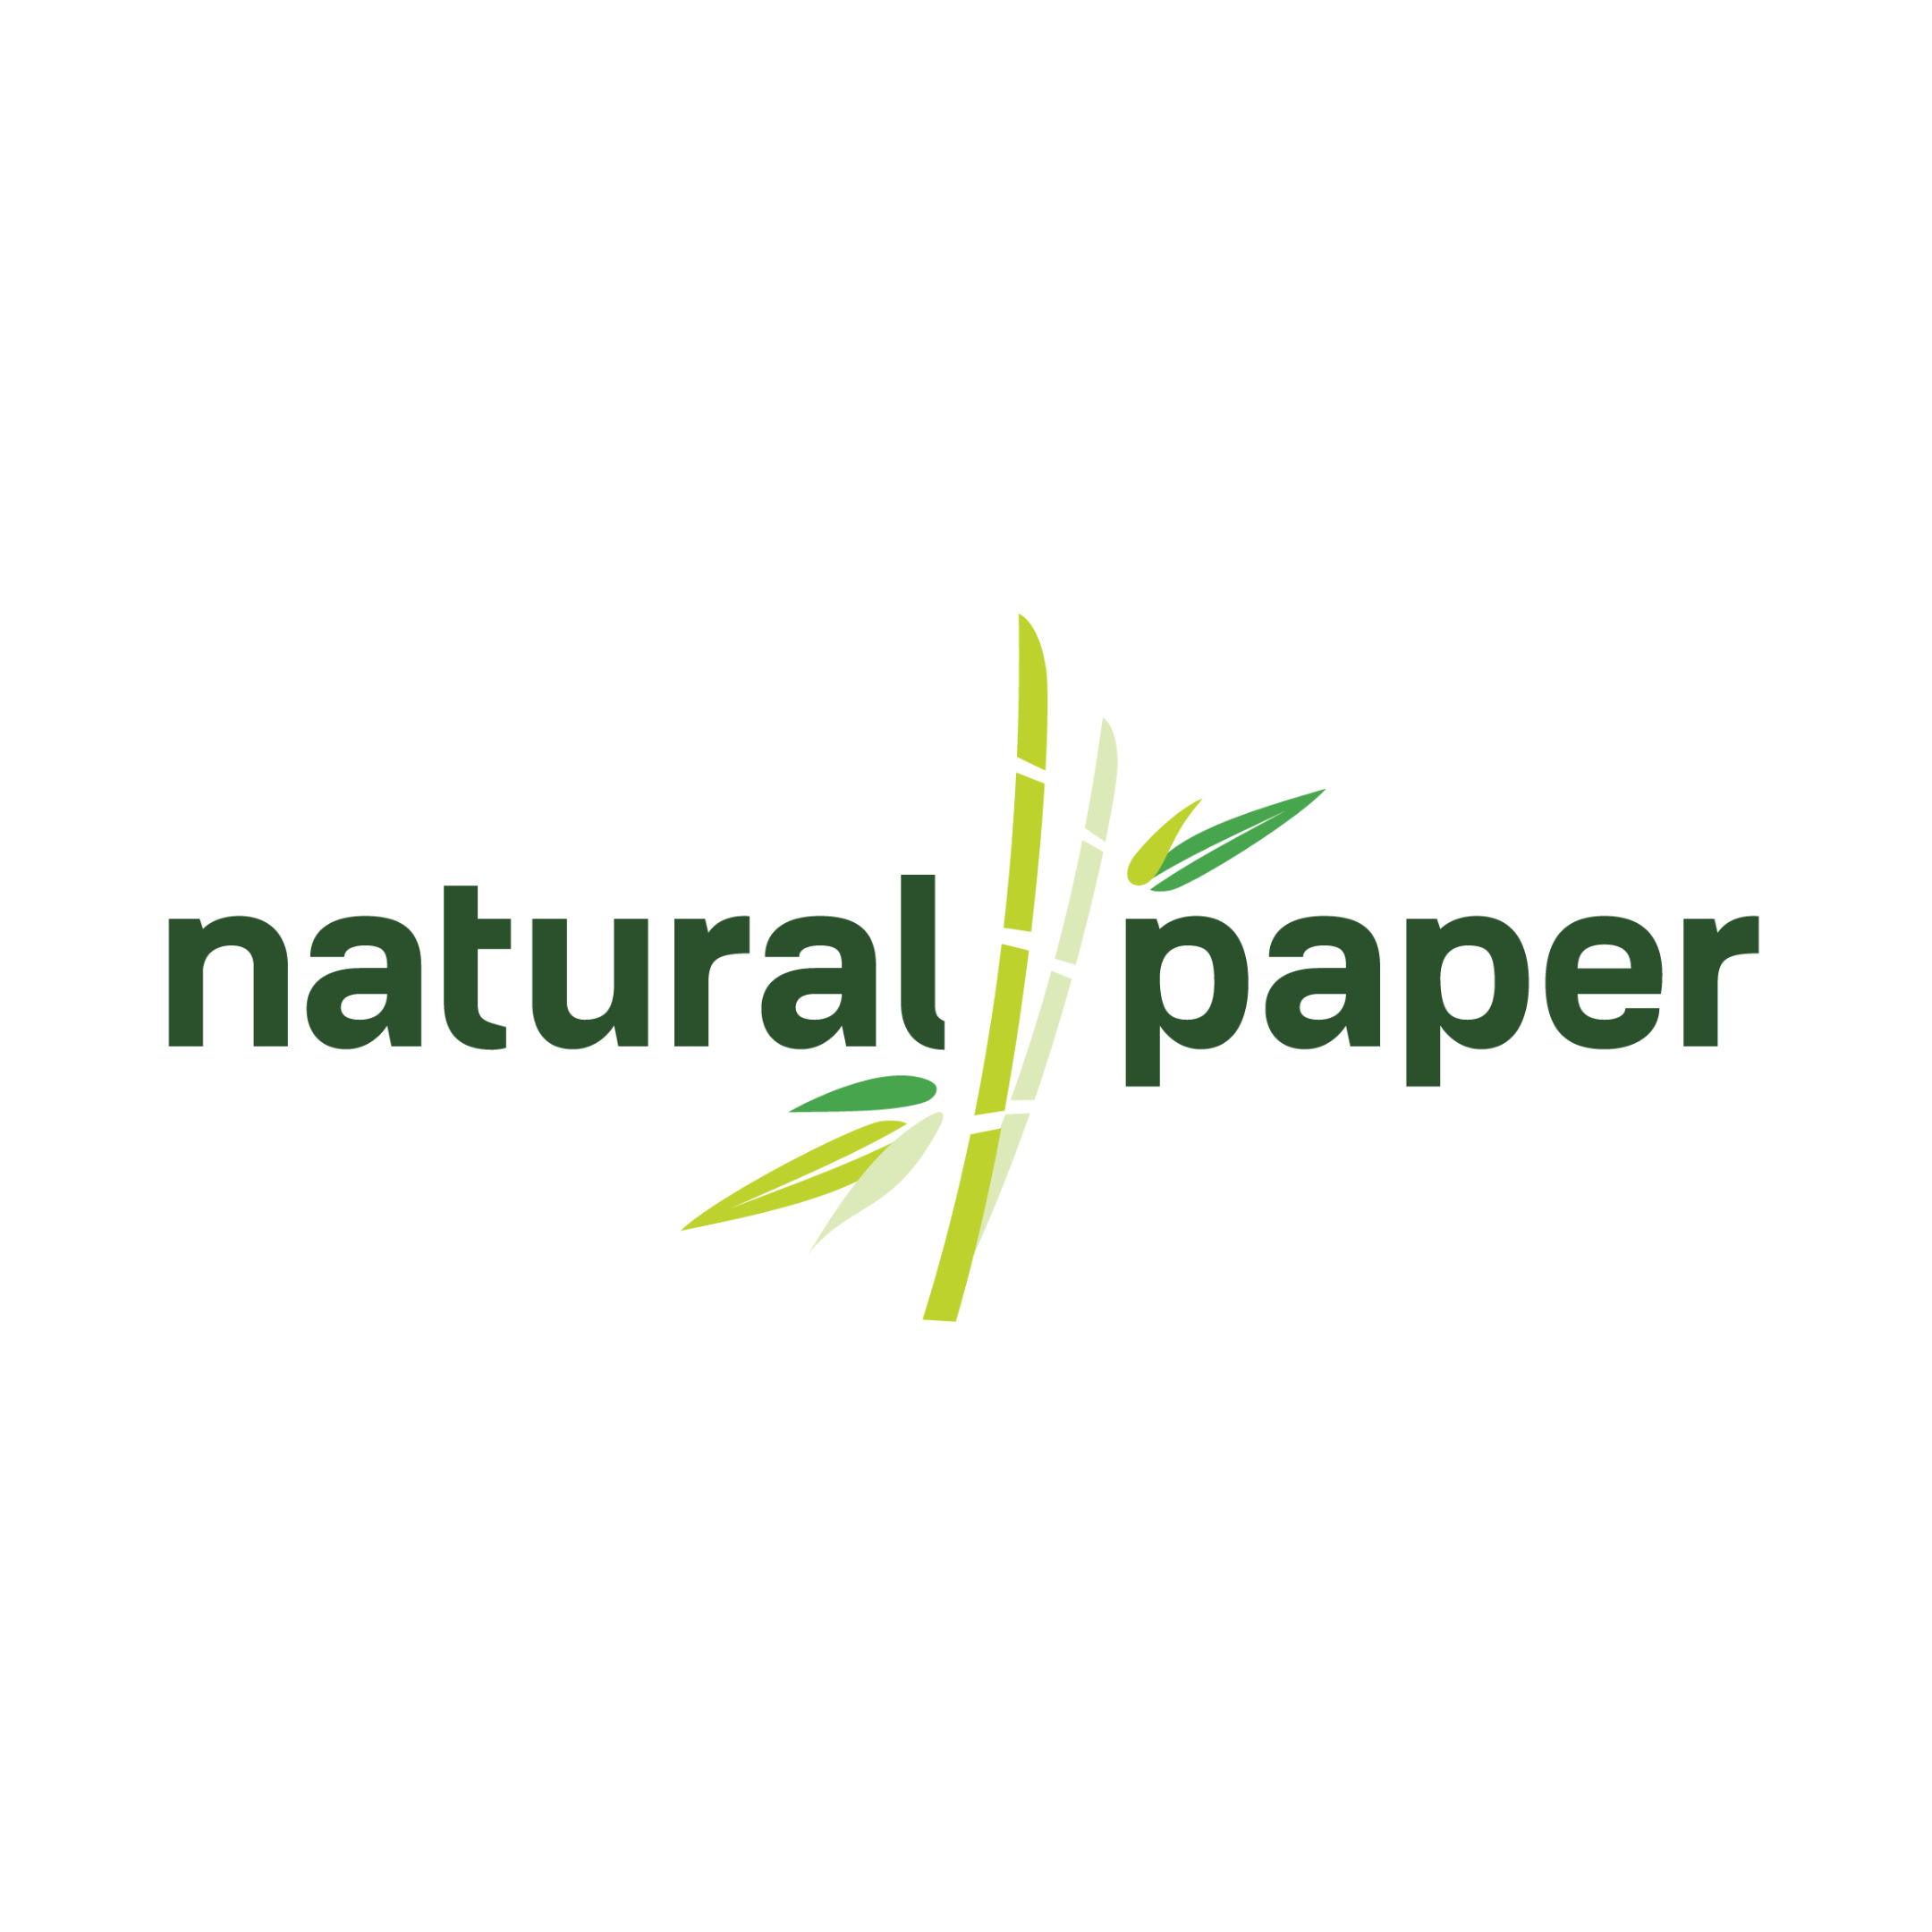 Gräf natural-paper